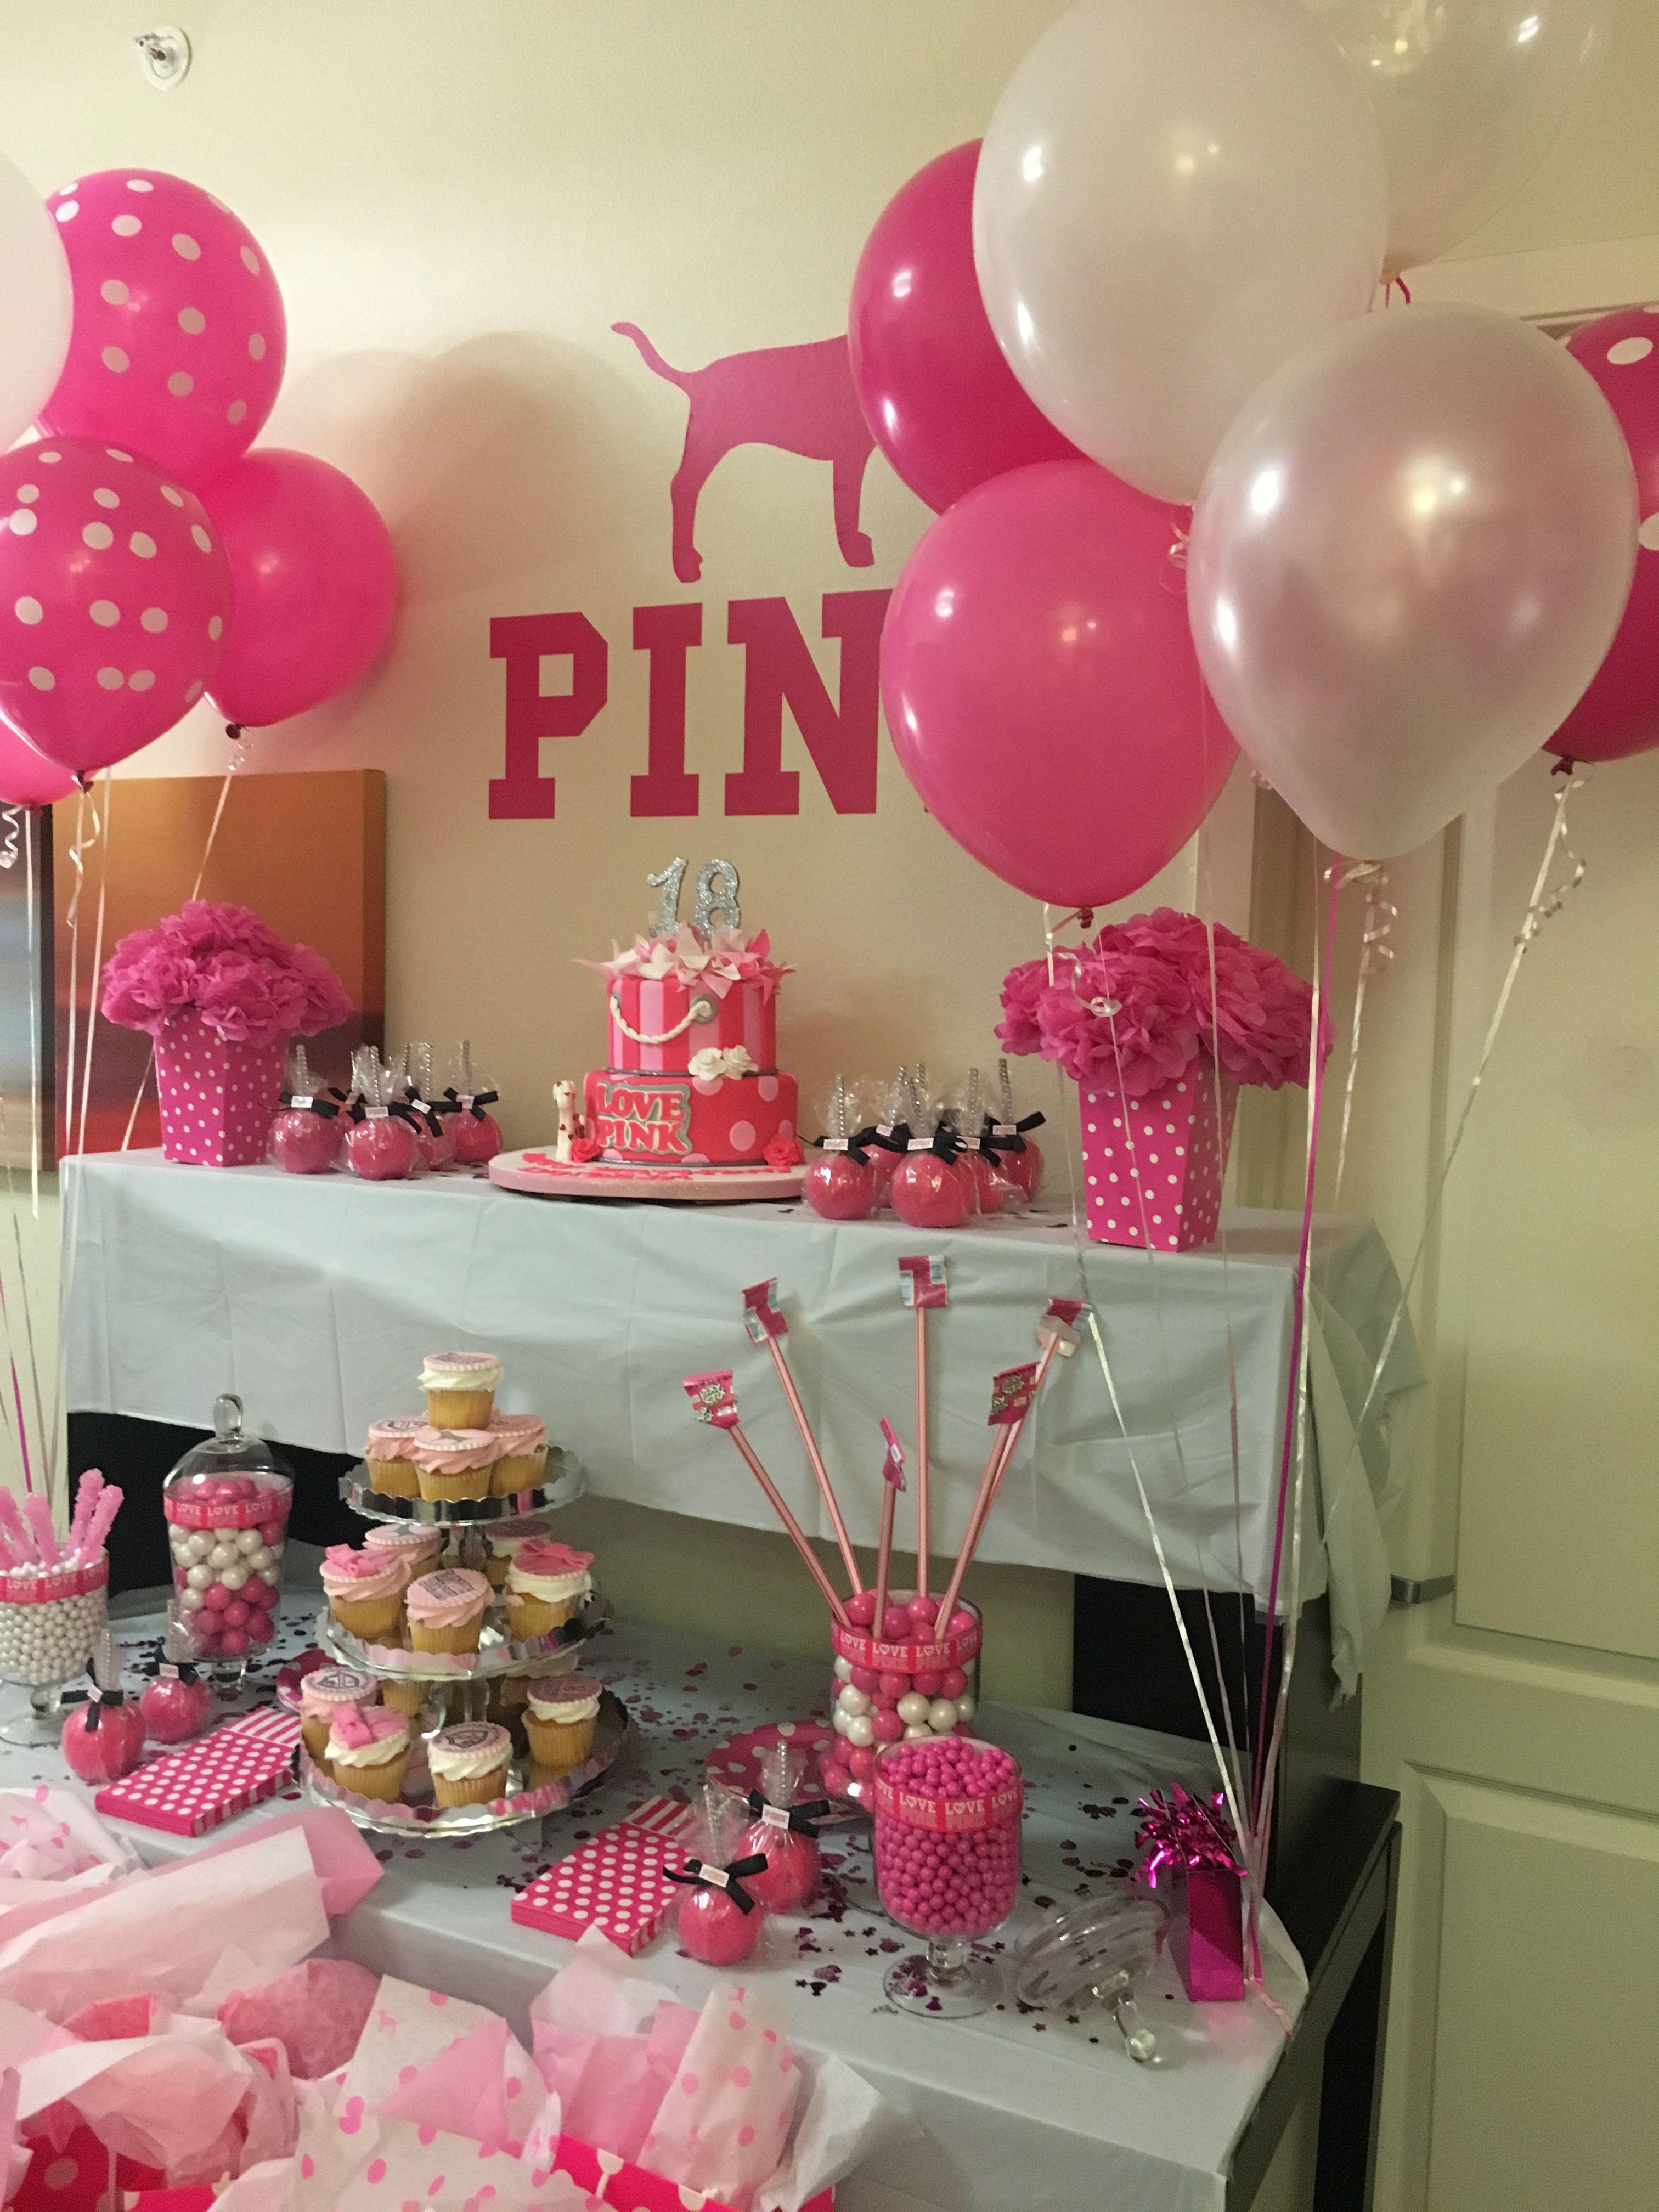 Pin by samantha alphonse on victoria secret pink party